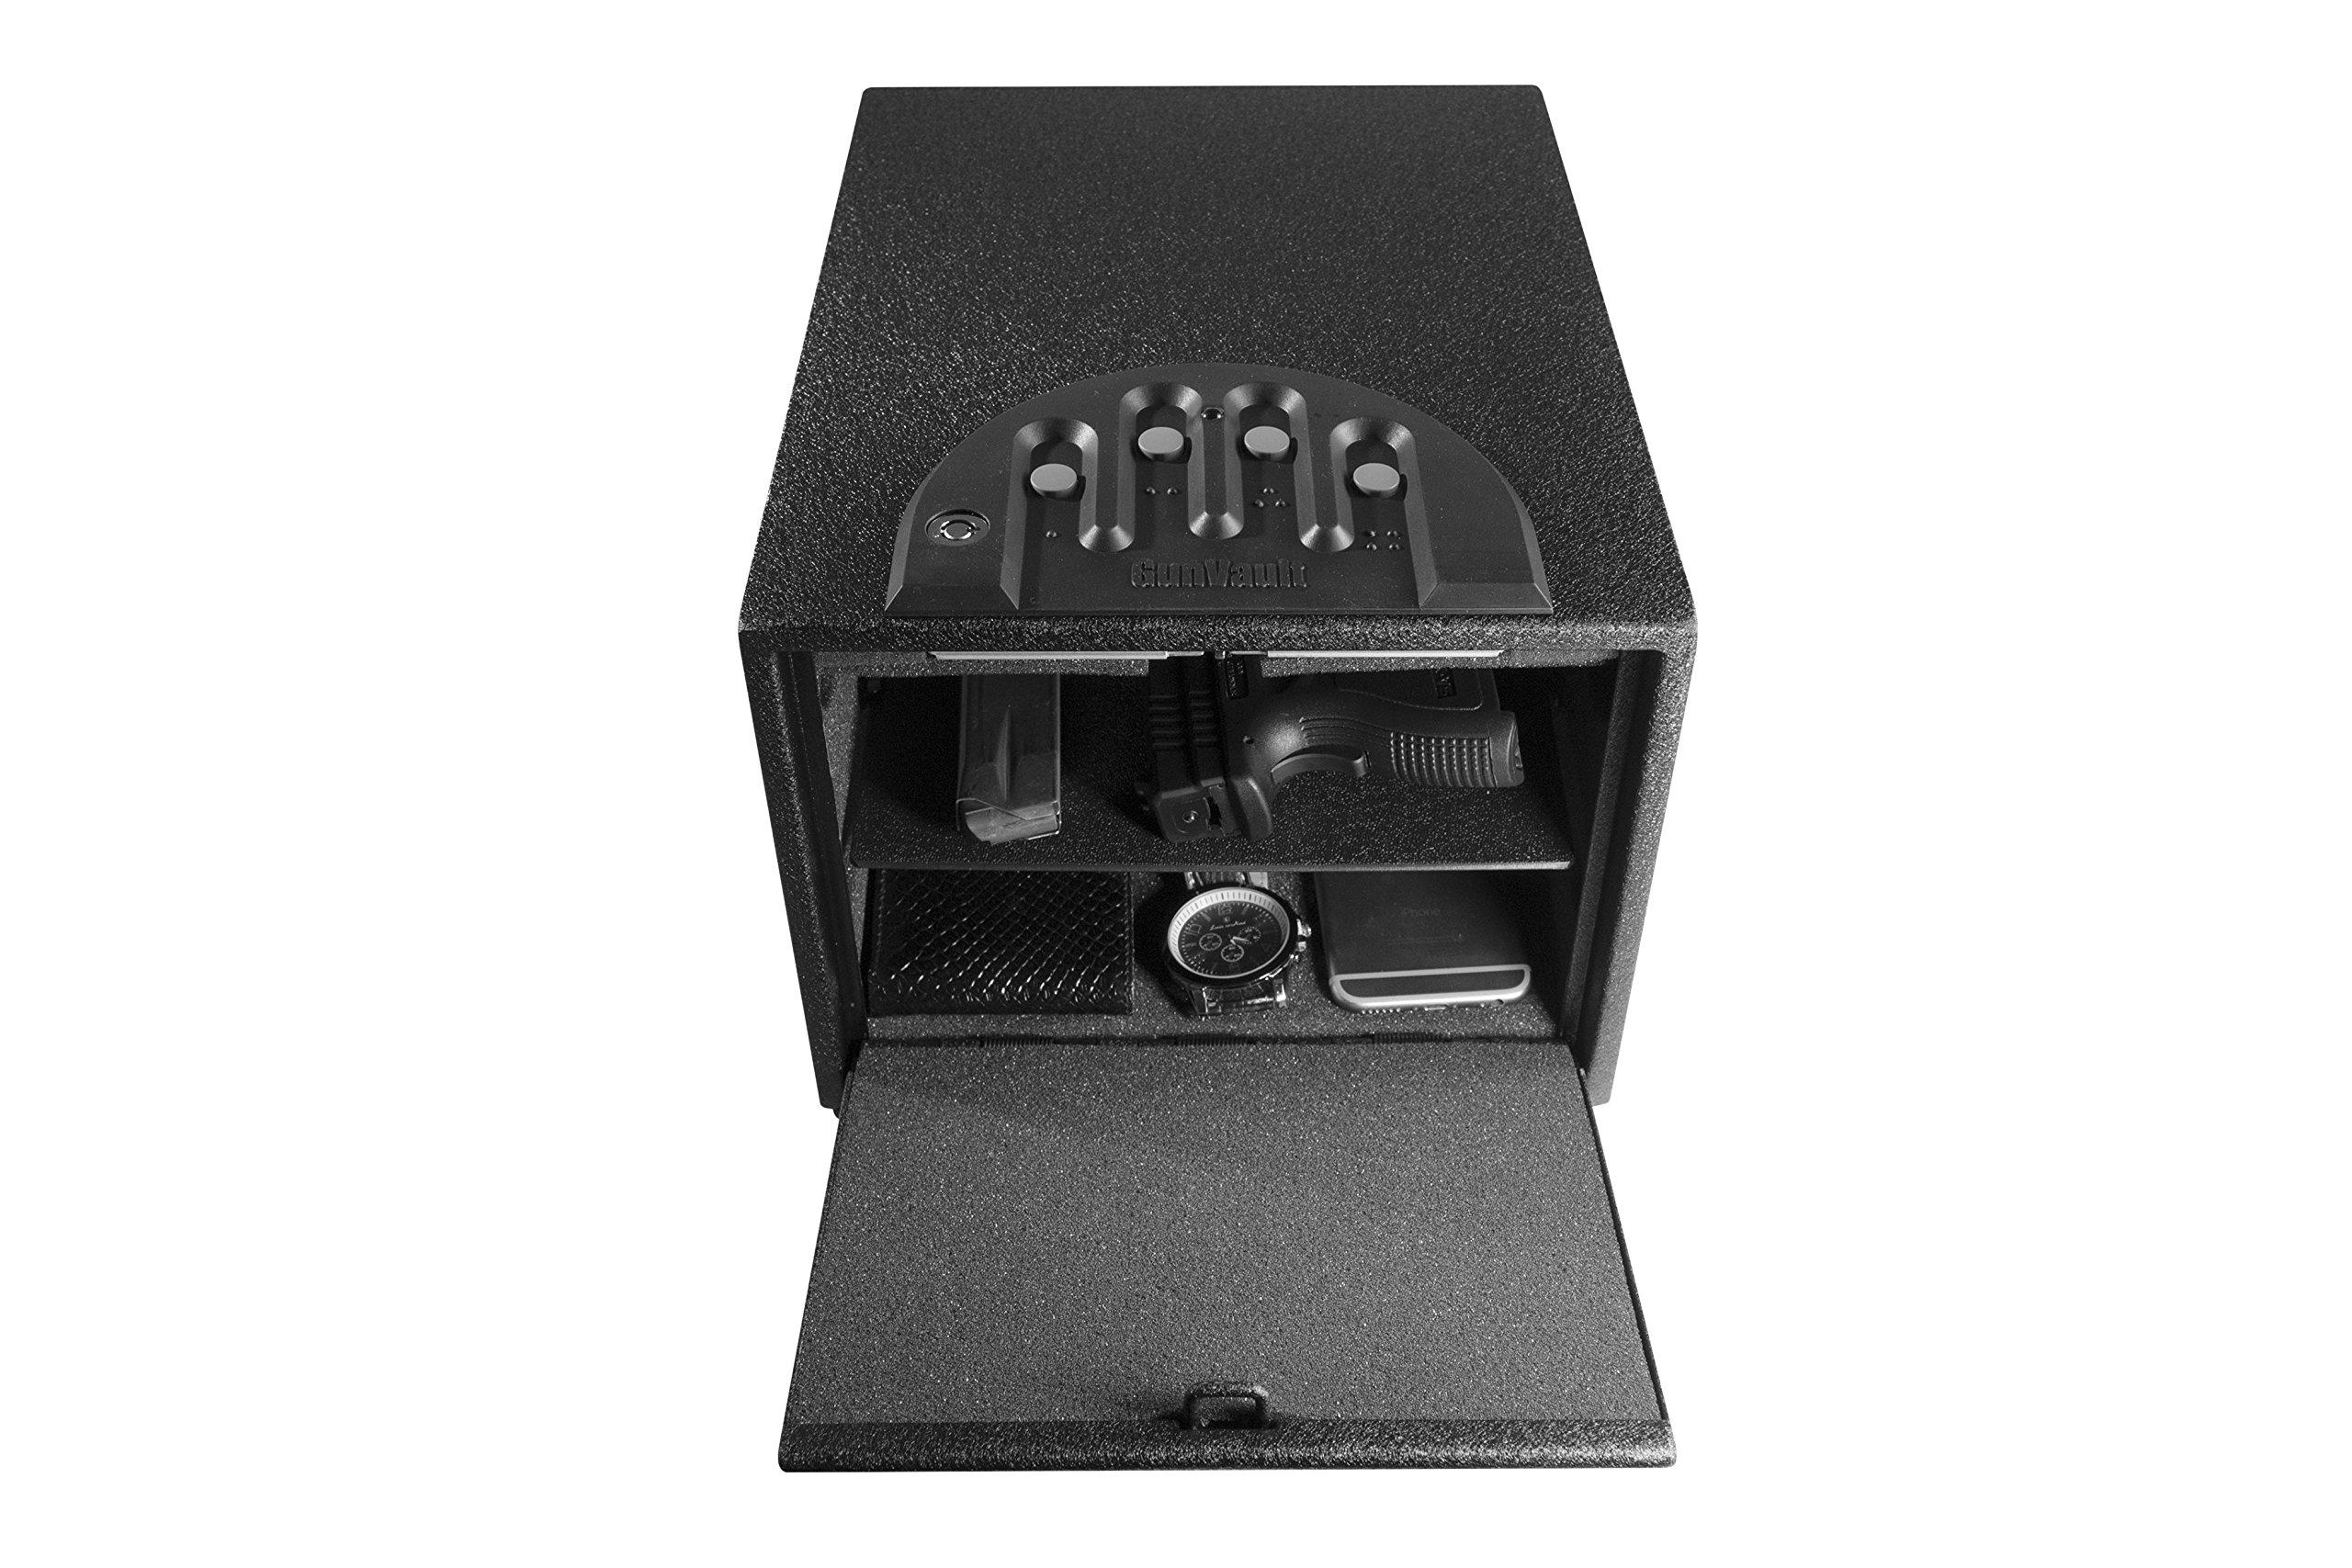 GunVault GV2000C-STD Multi Vault Standard Gun Safe by GunVault (Image #1)